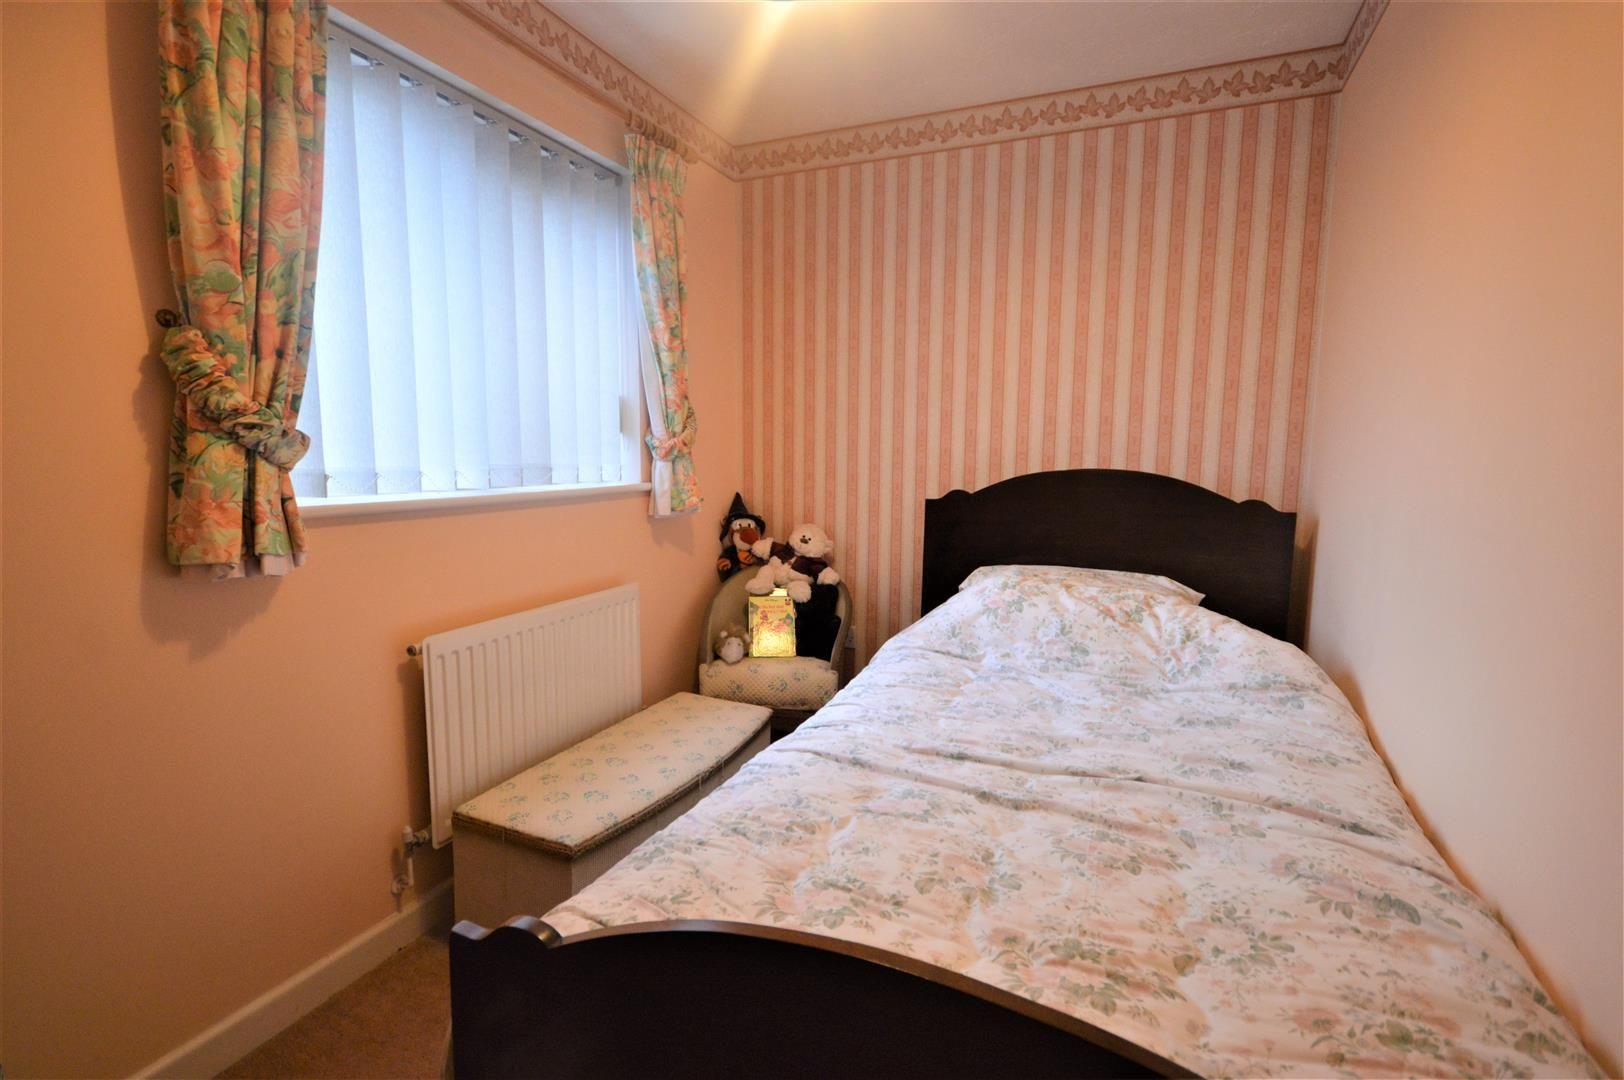 3 bed detached for sale in Leominster 7